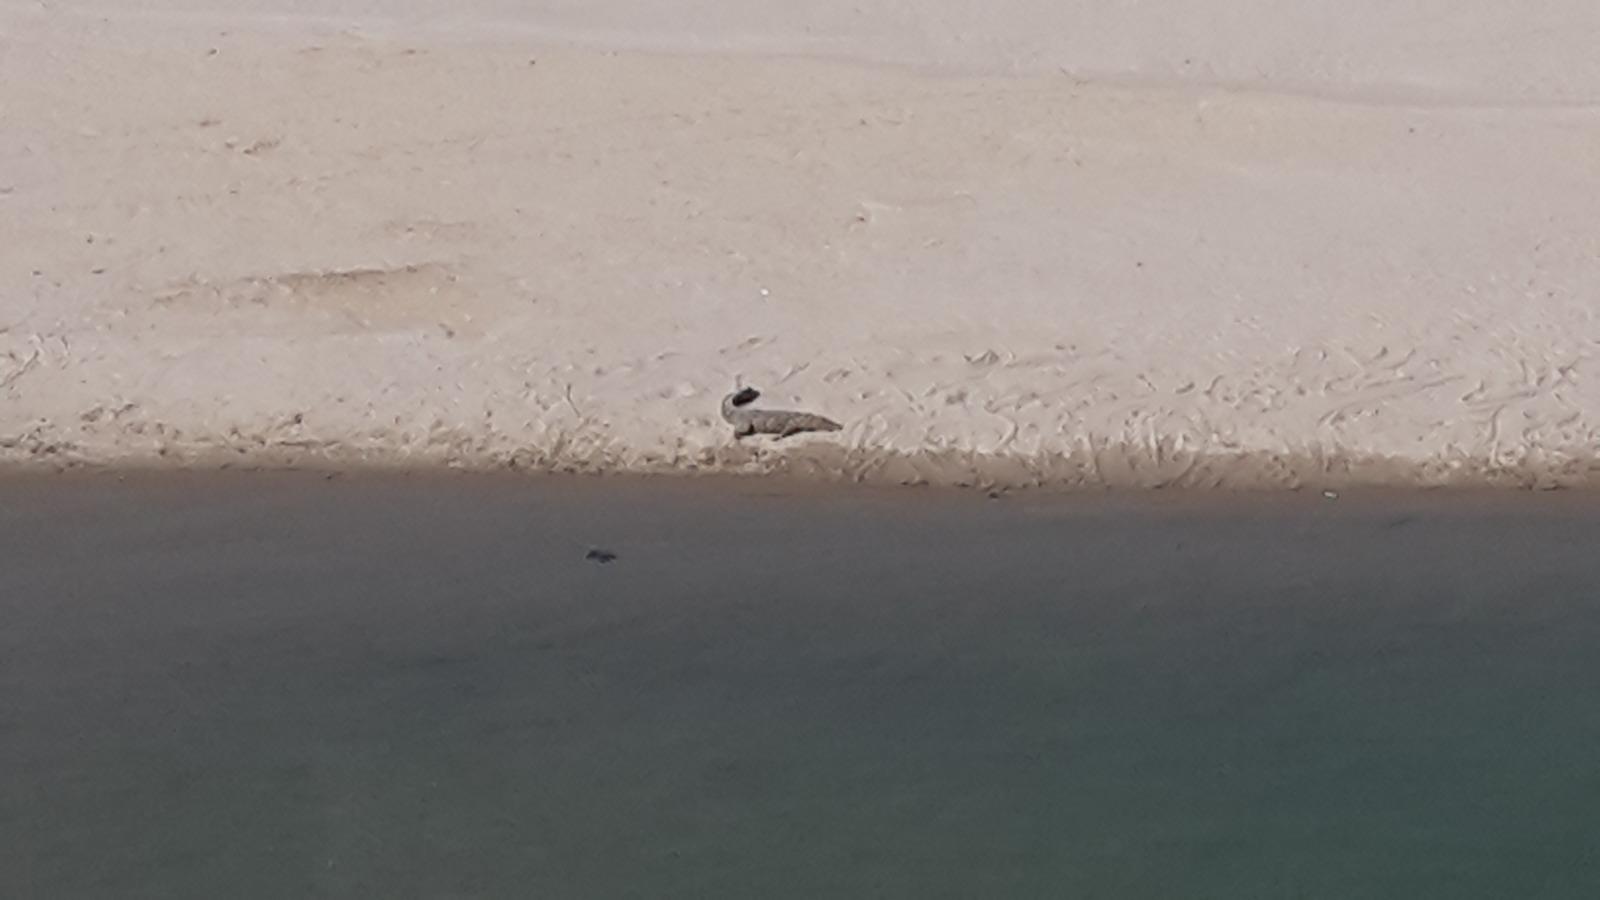 Crocodile by a river